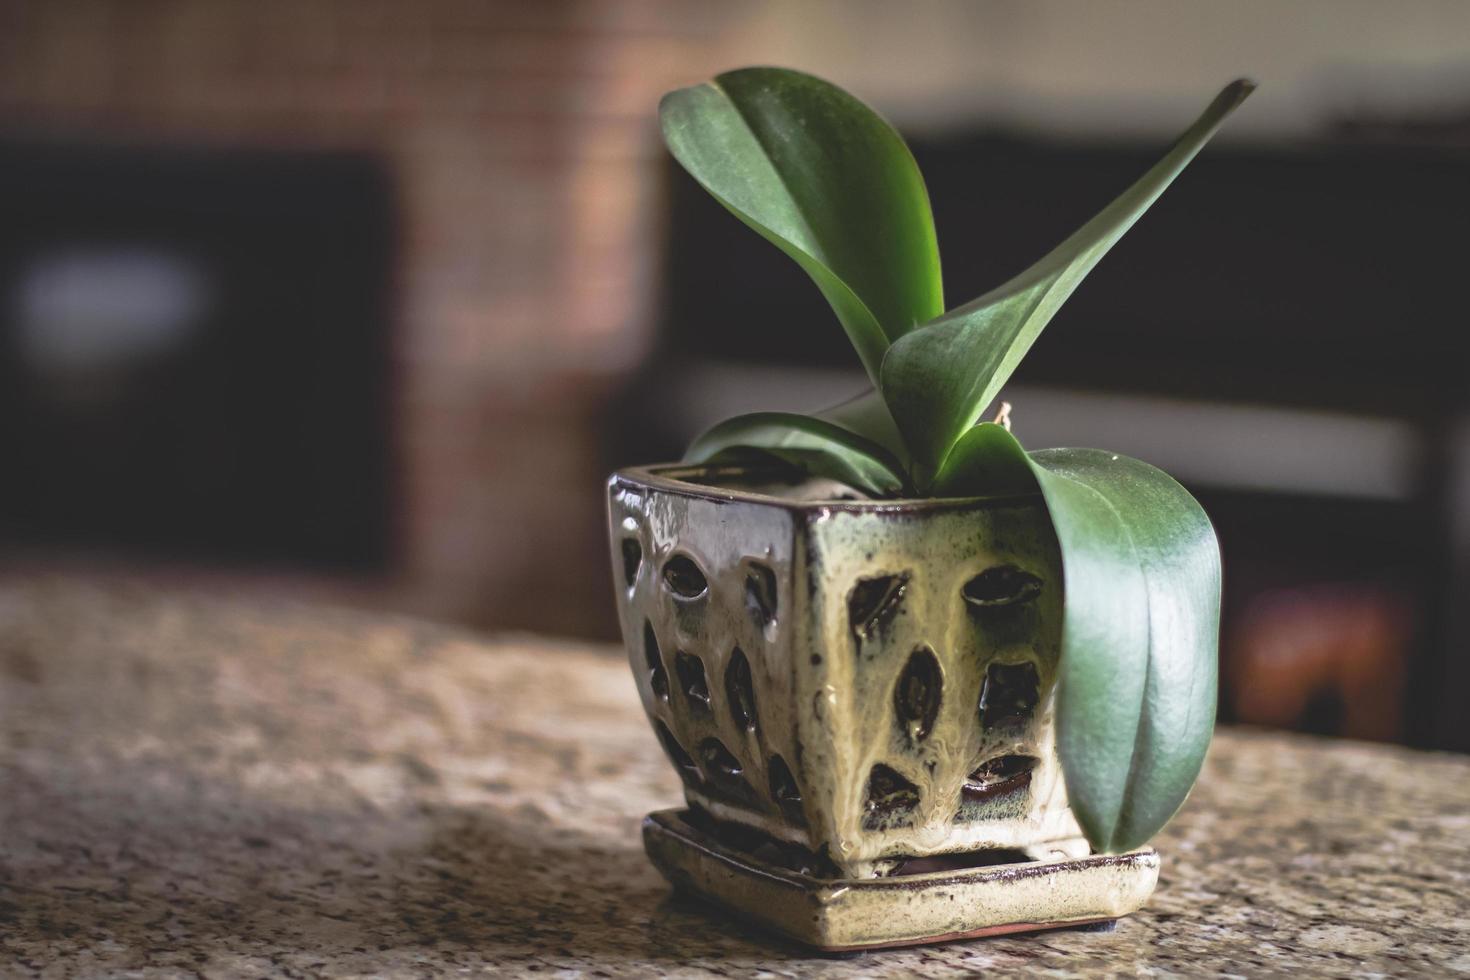 groene potplant foto